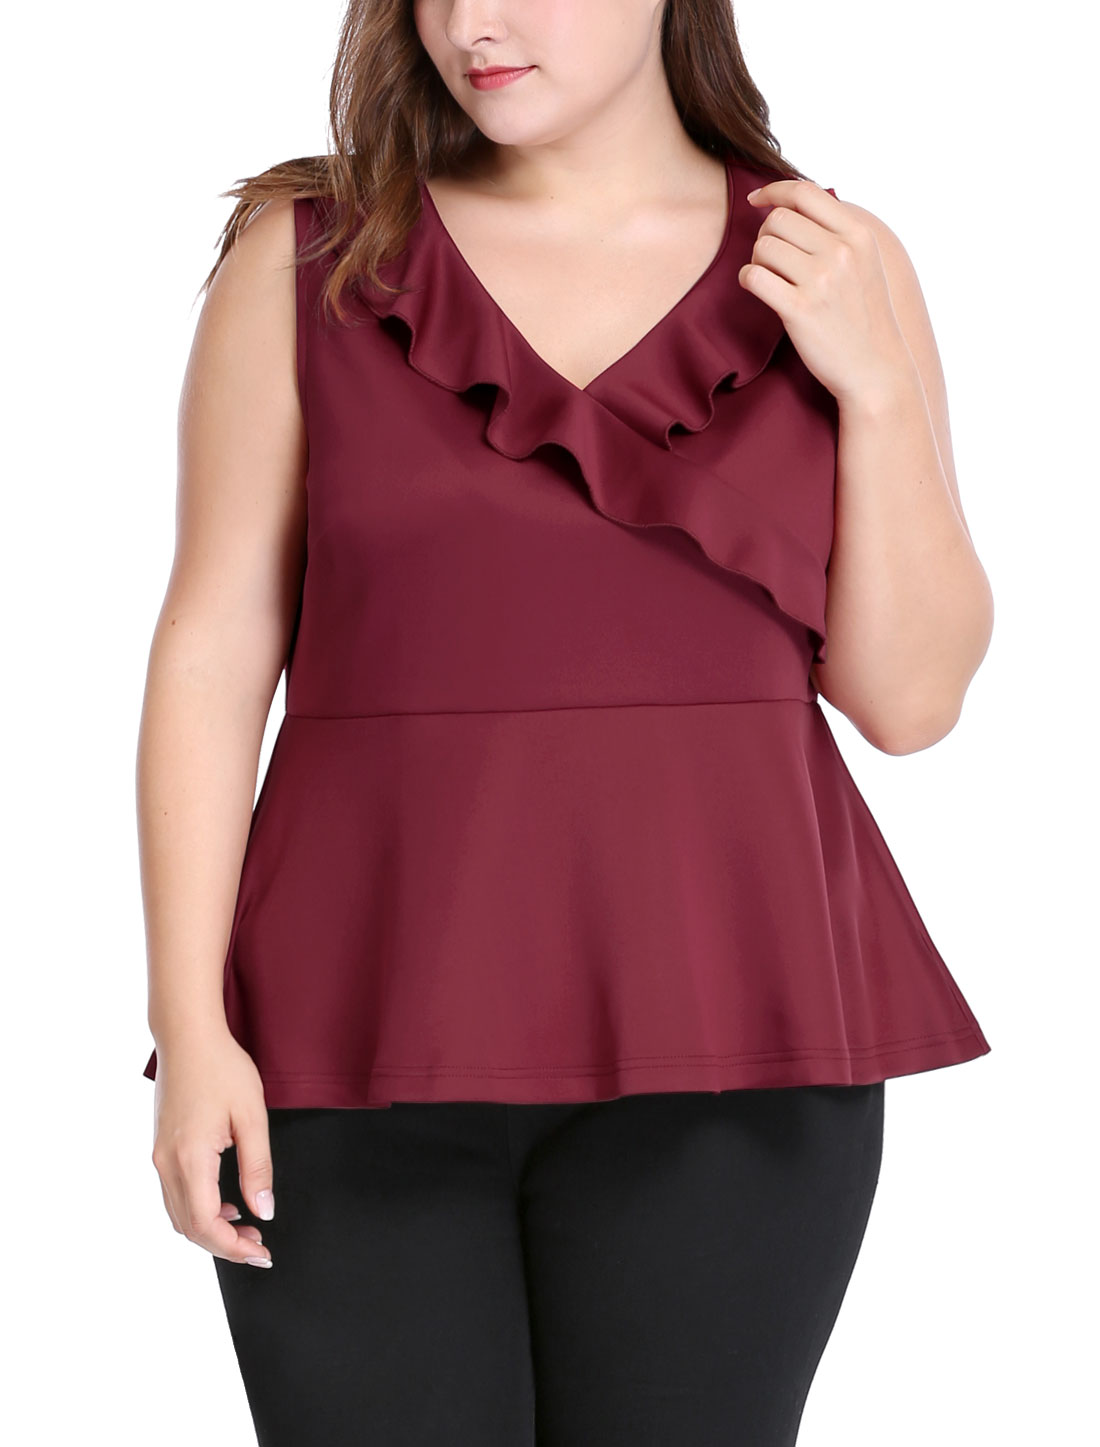 Women Plus Size V Neck Sleeveless Ruffle Trim Peplum Top Red 3X